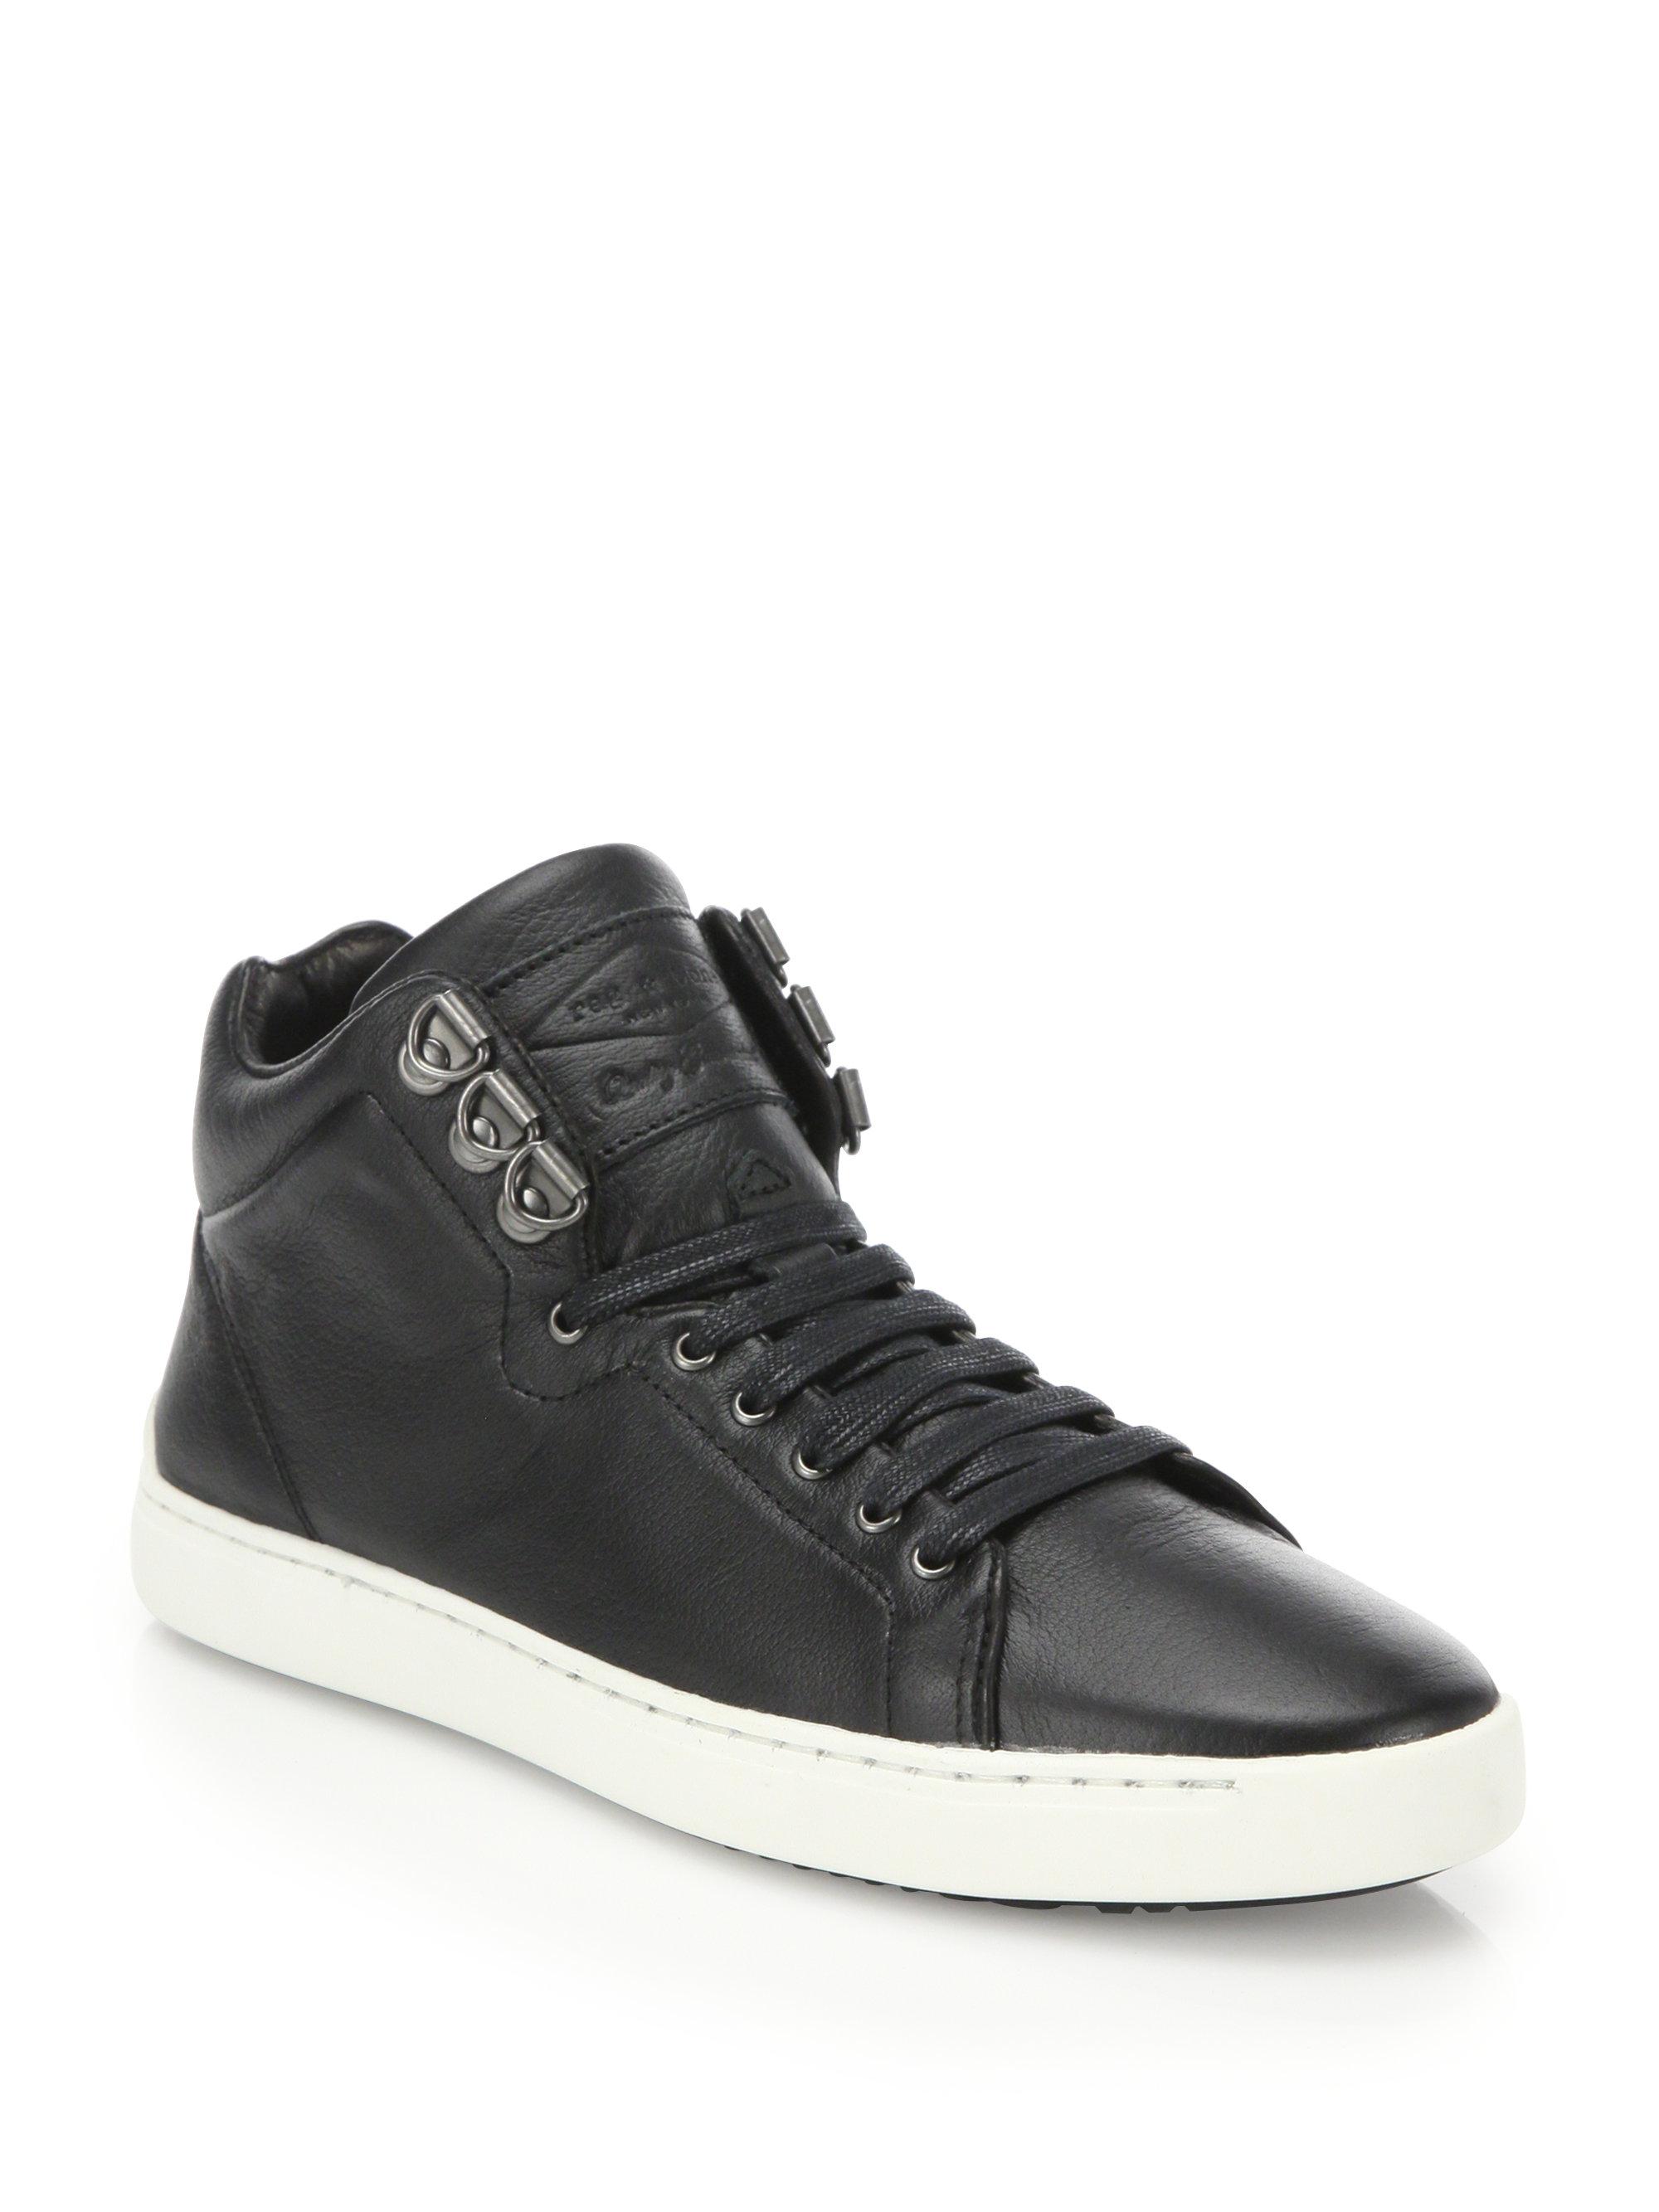 Rag Amp Bone Kent Leather High Top Sneakers In Black For Men